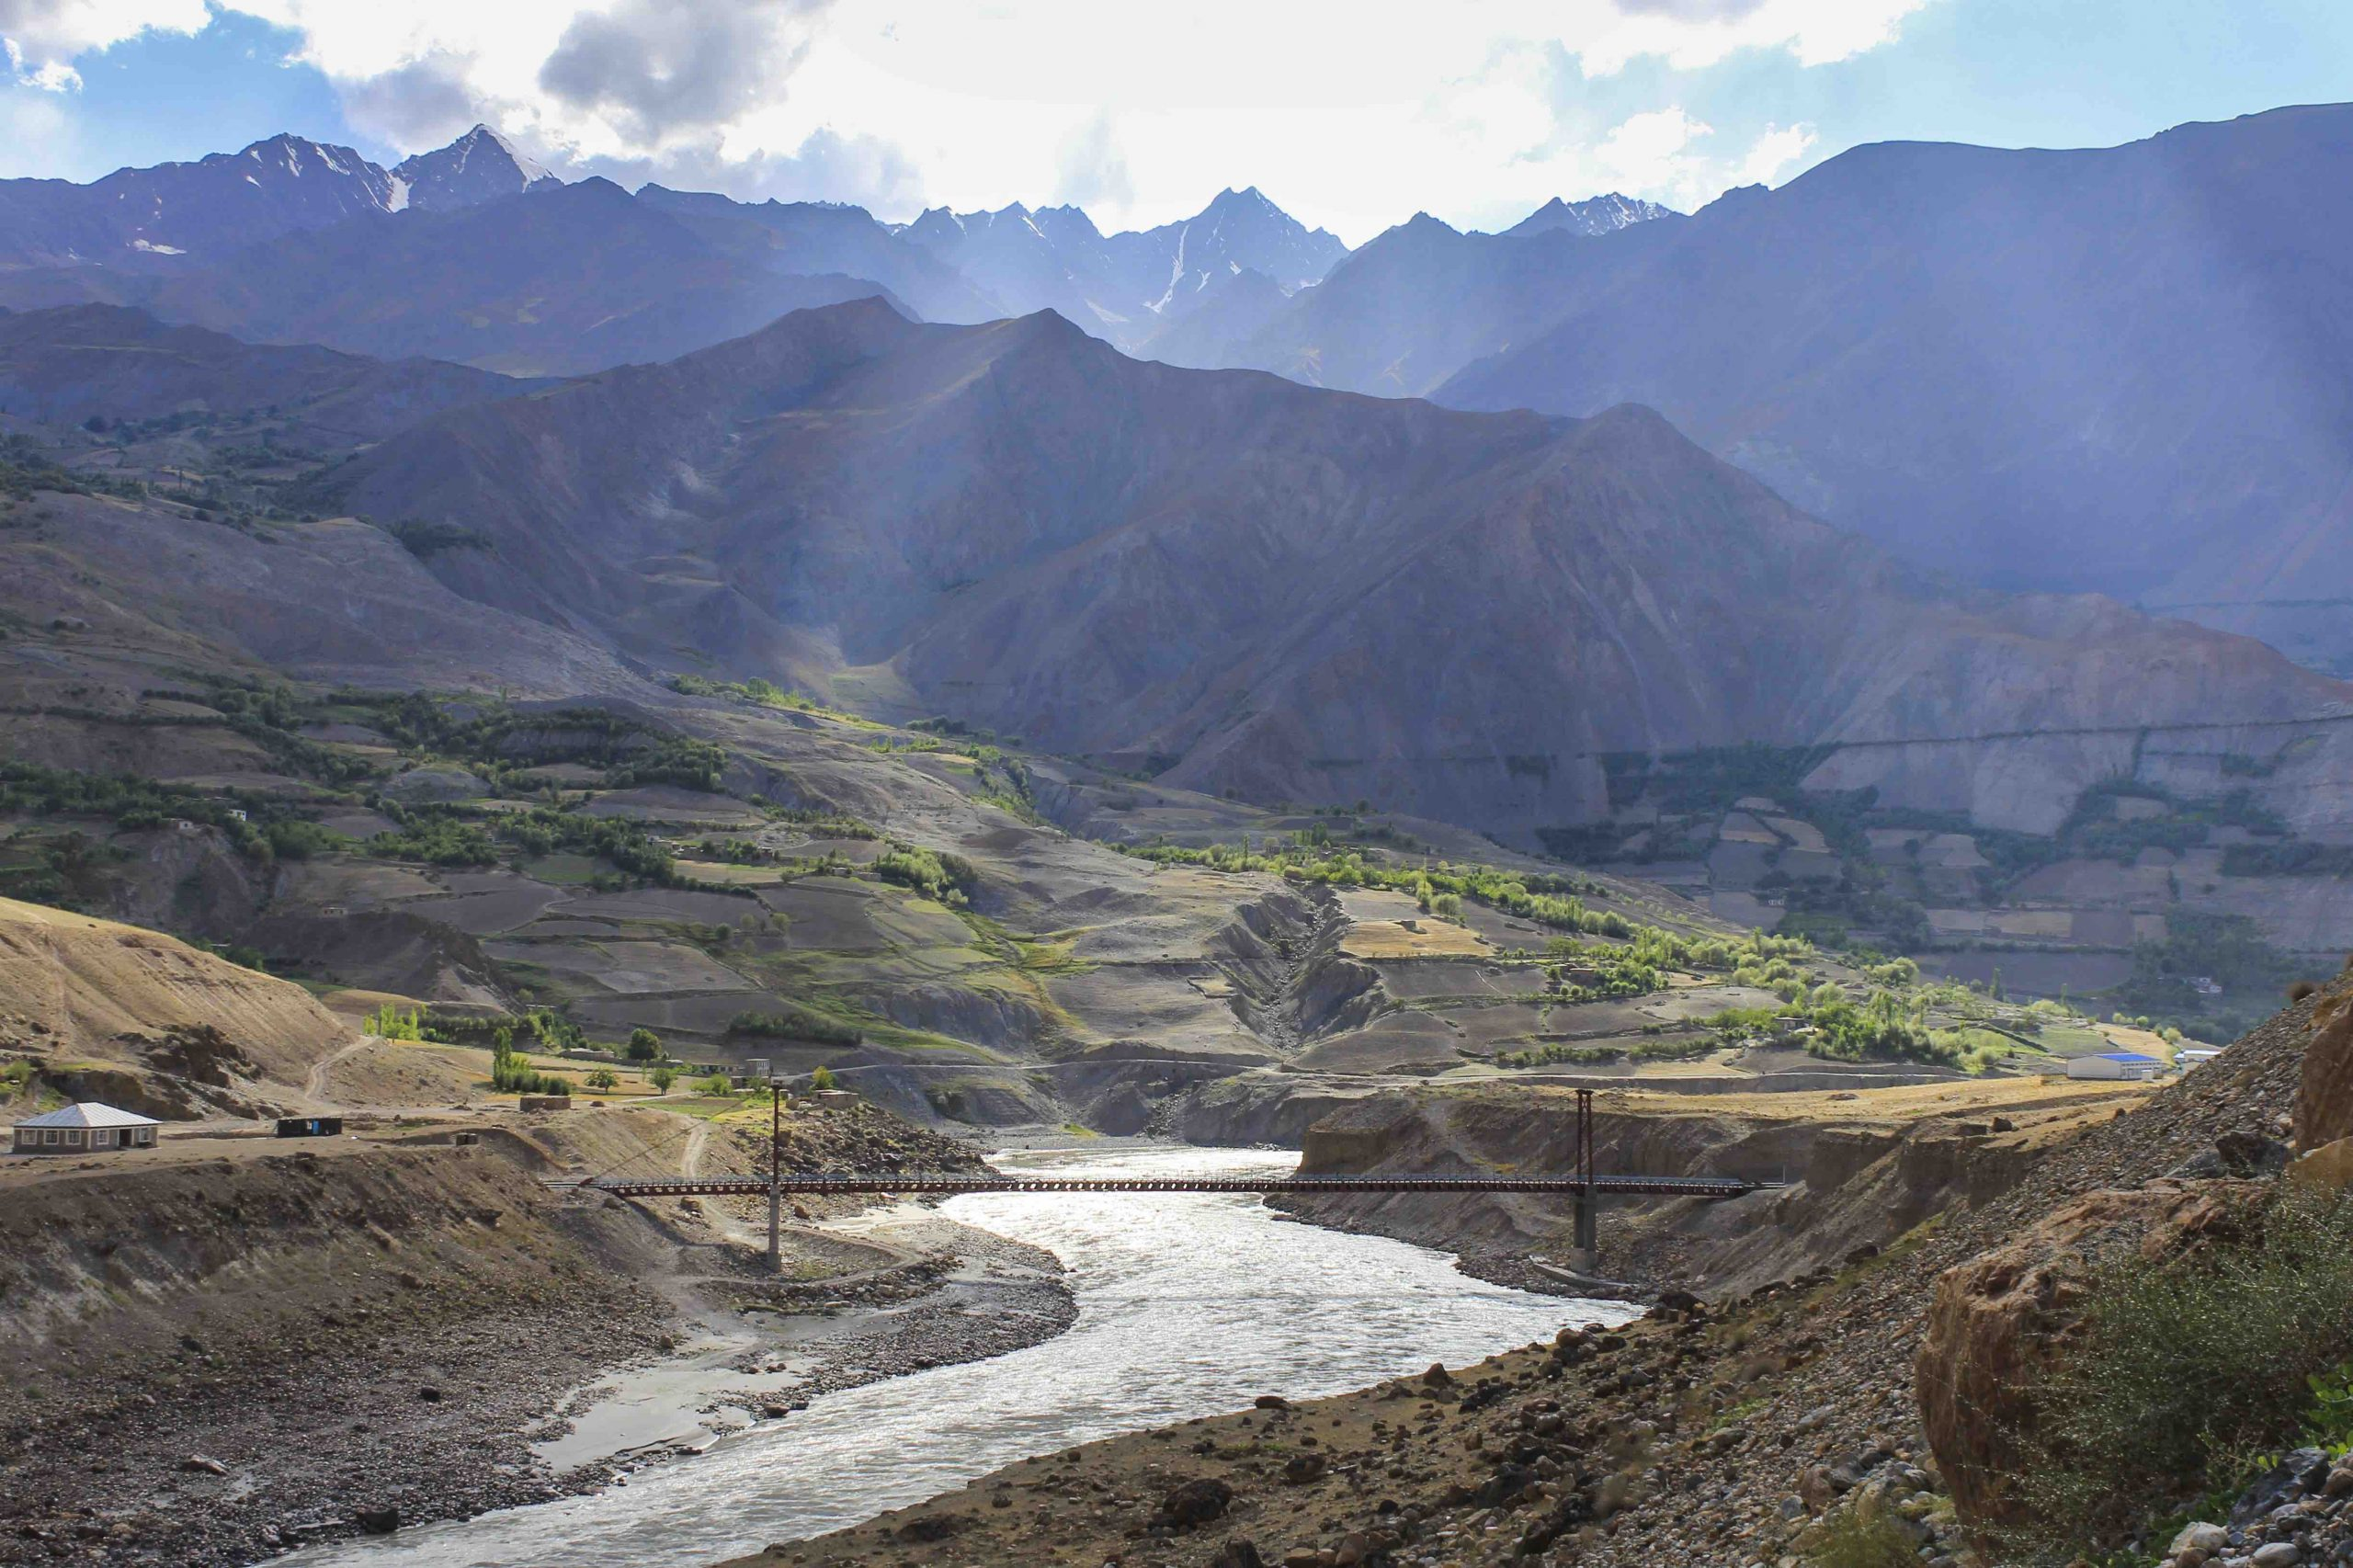 The border of Afghanistan and Tajikistan.